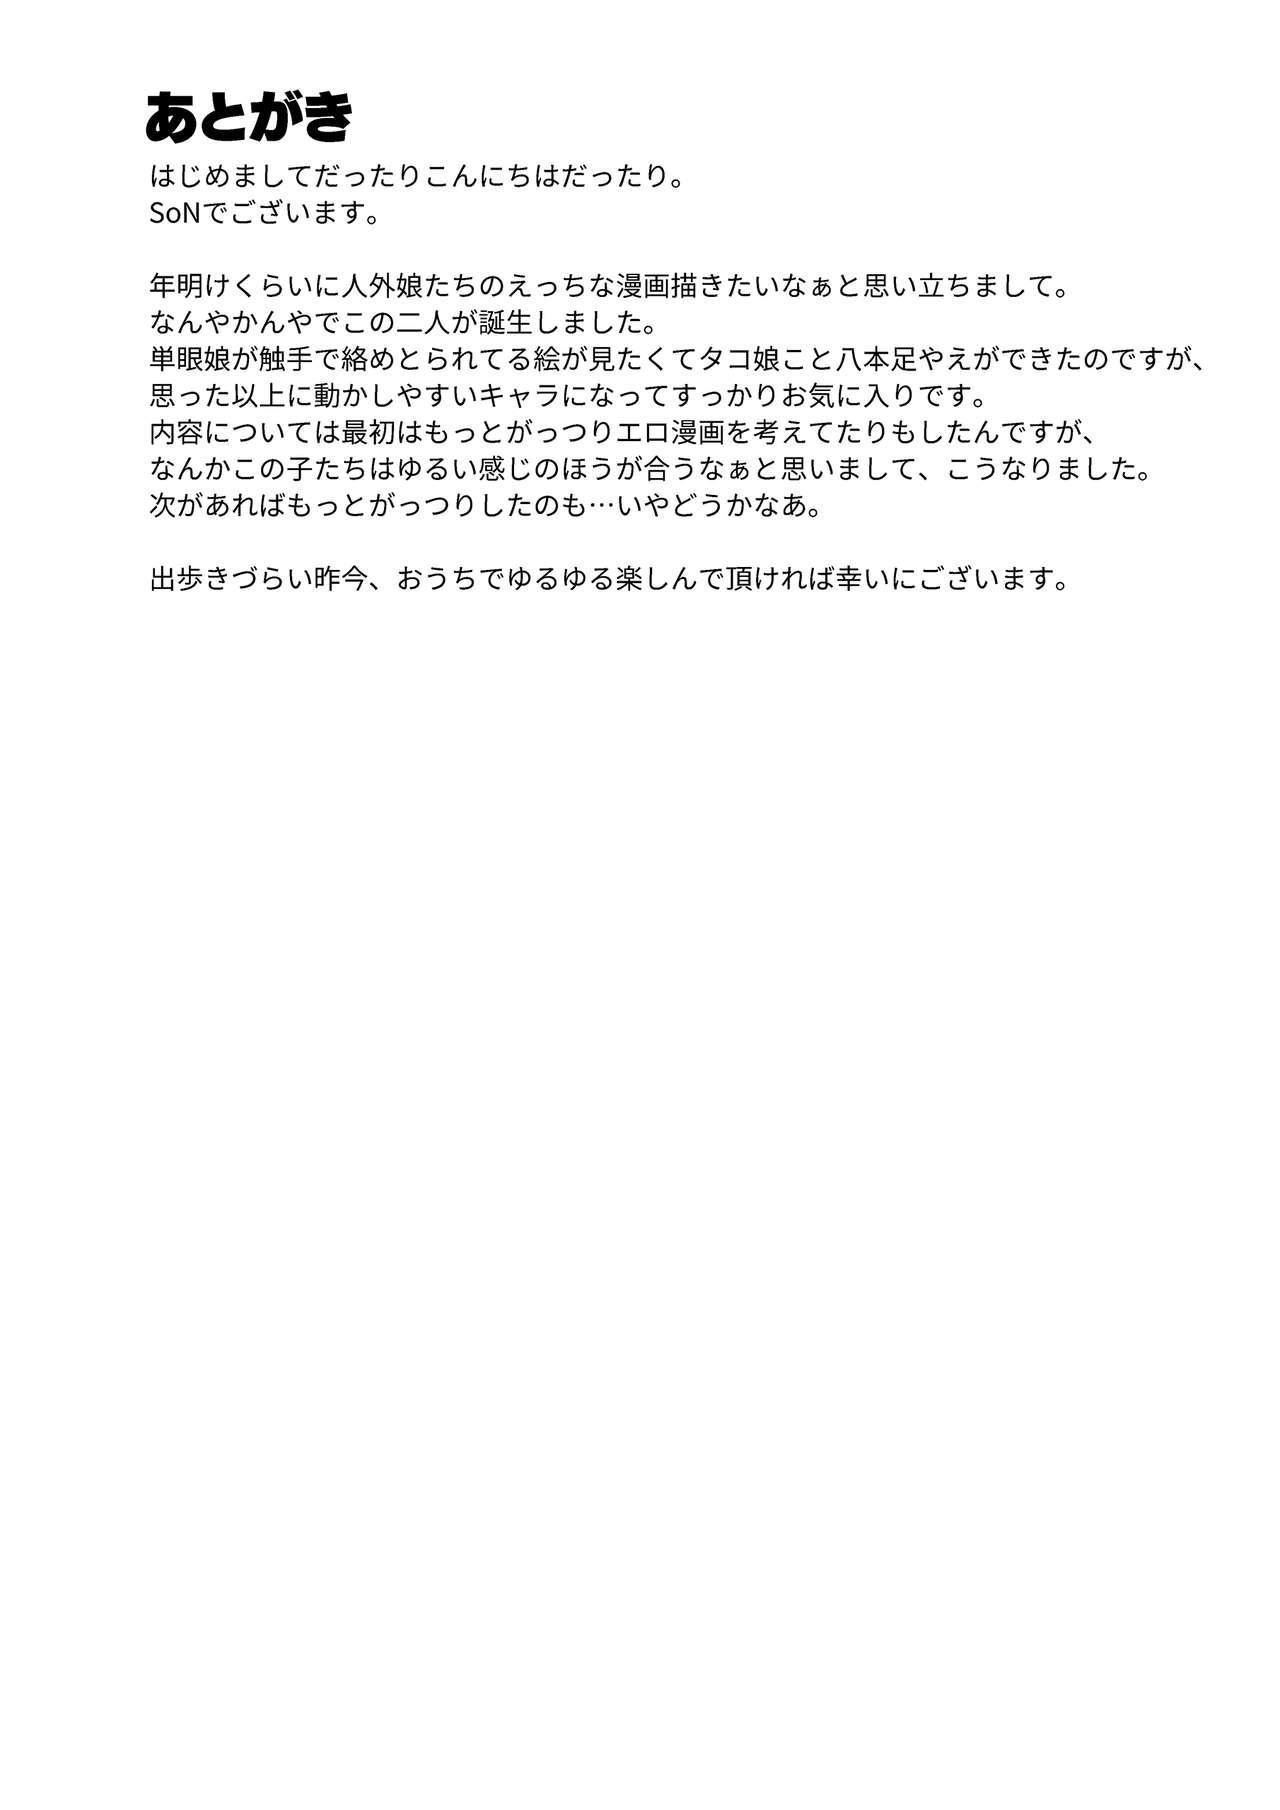 Tako Musume to Tangan Musume ga XX Suru Dake. 21